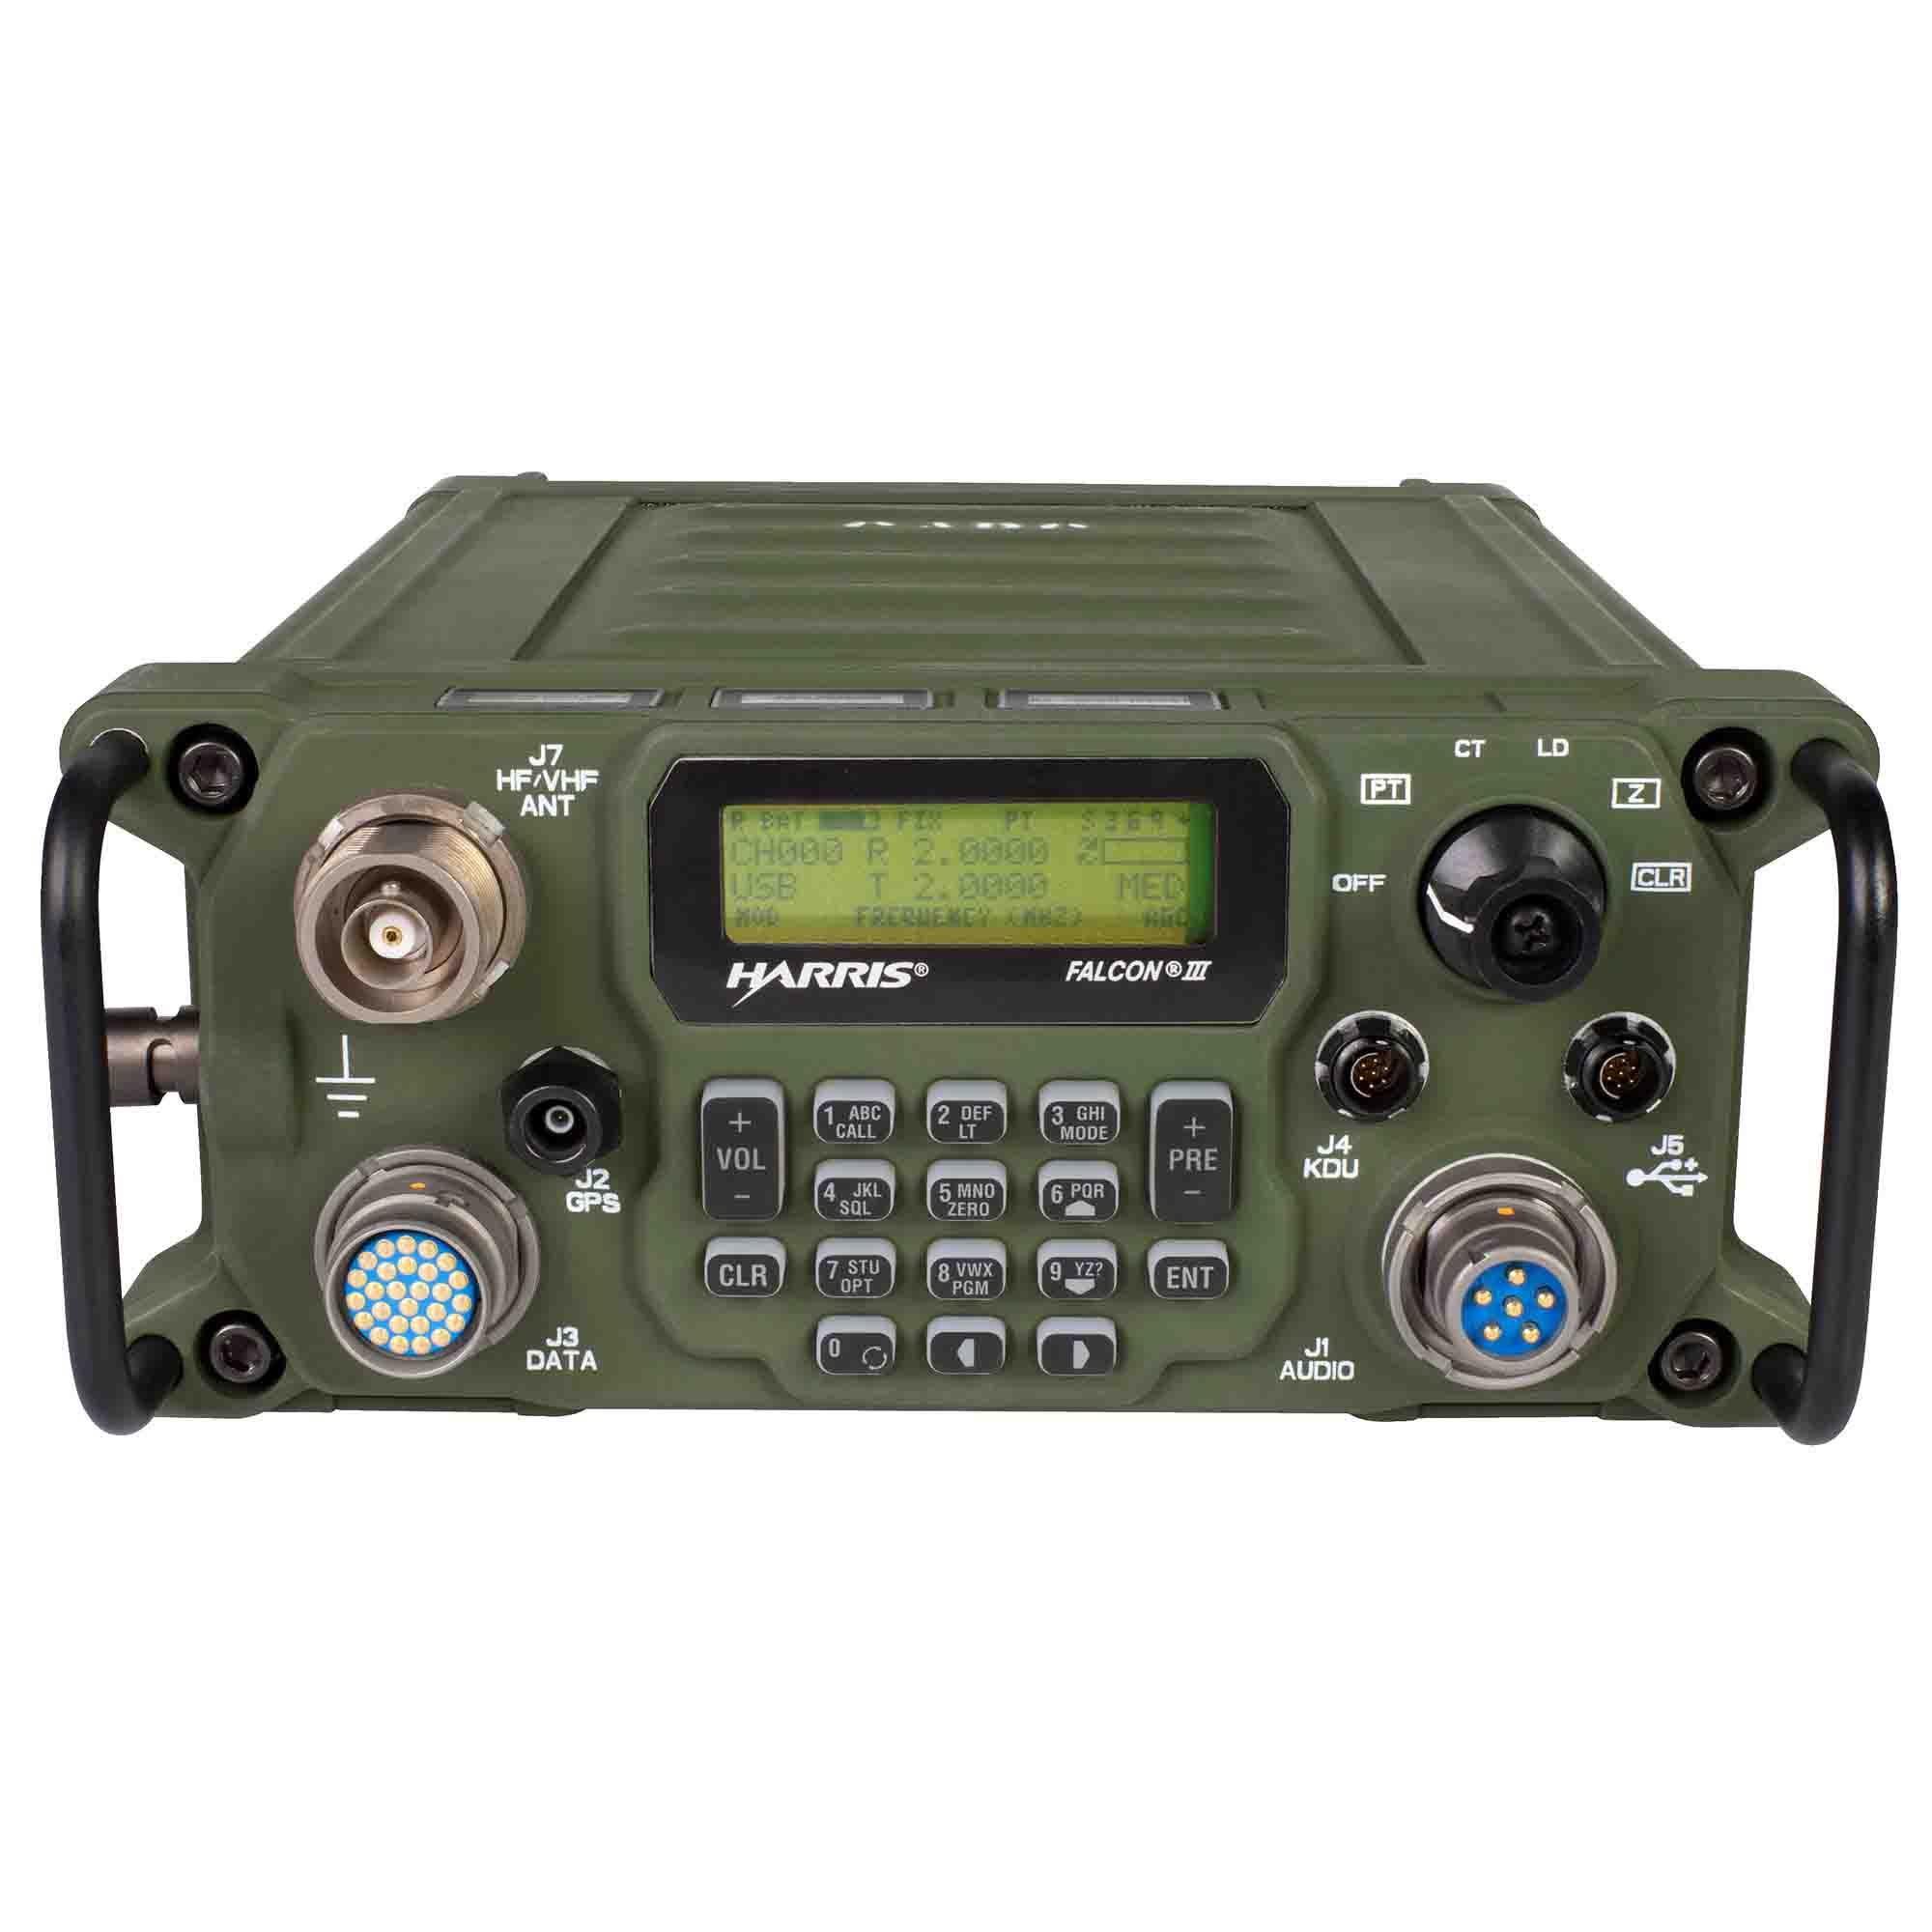 Dayton Hamvention Military Radio Check Ins 2017 | ve3ips